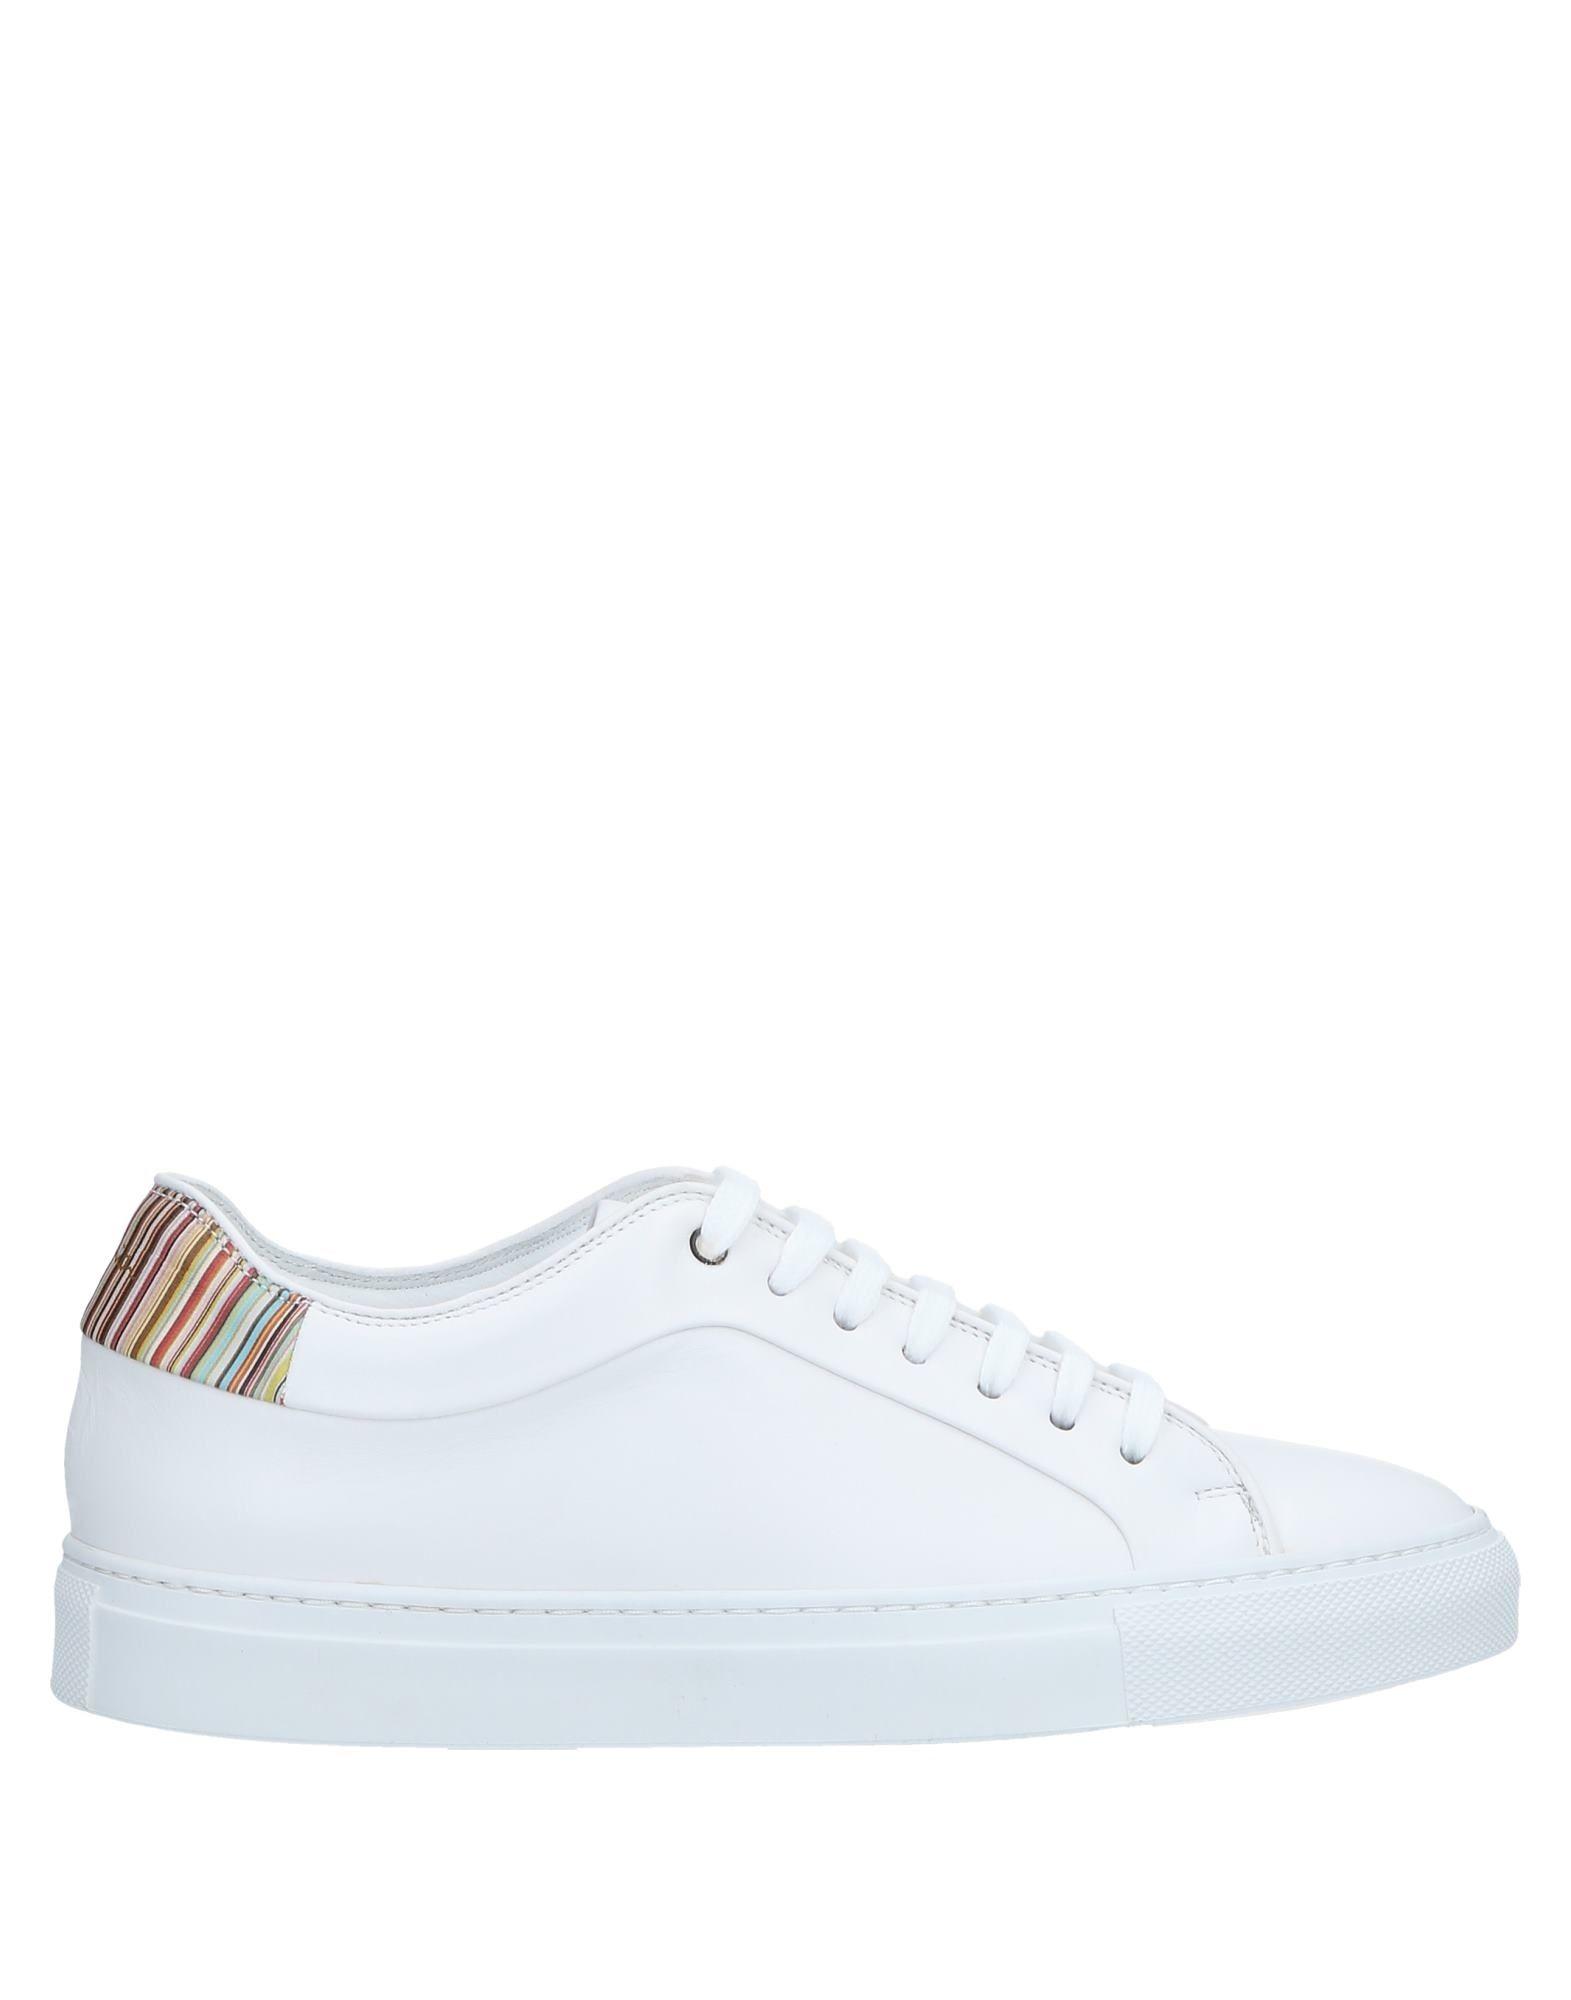 Paul Smith Sneakers Damen  11530613MK Neue Schuhe